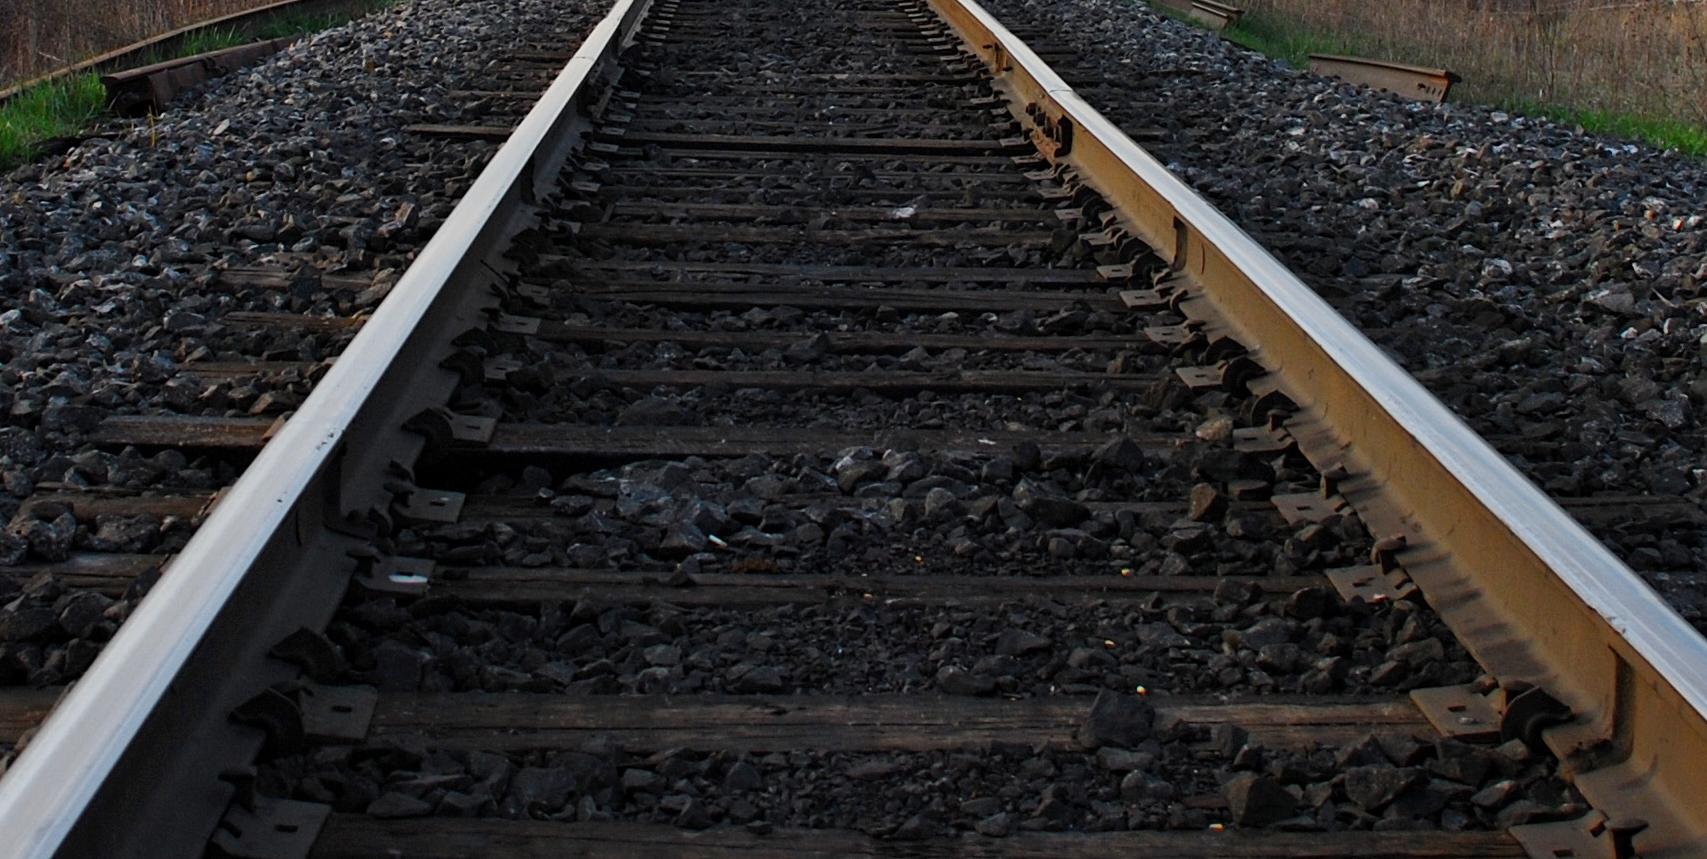 16 Empty Railroad Cars Derail in Topeka